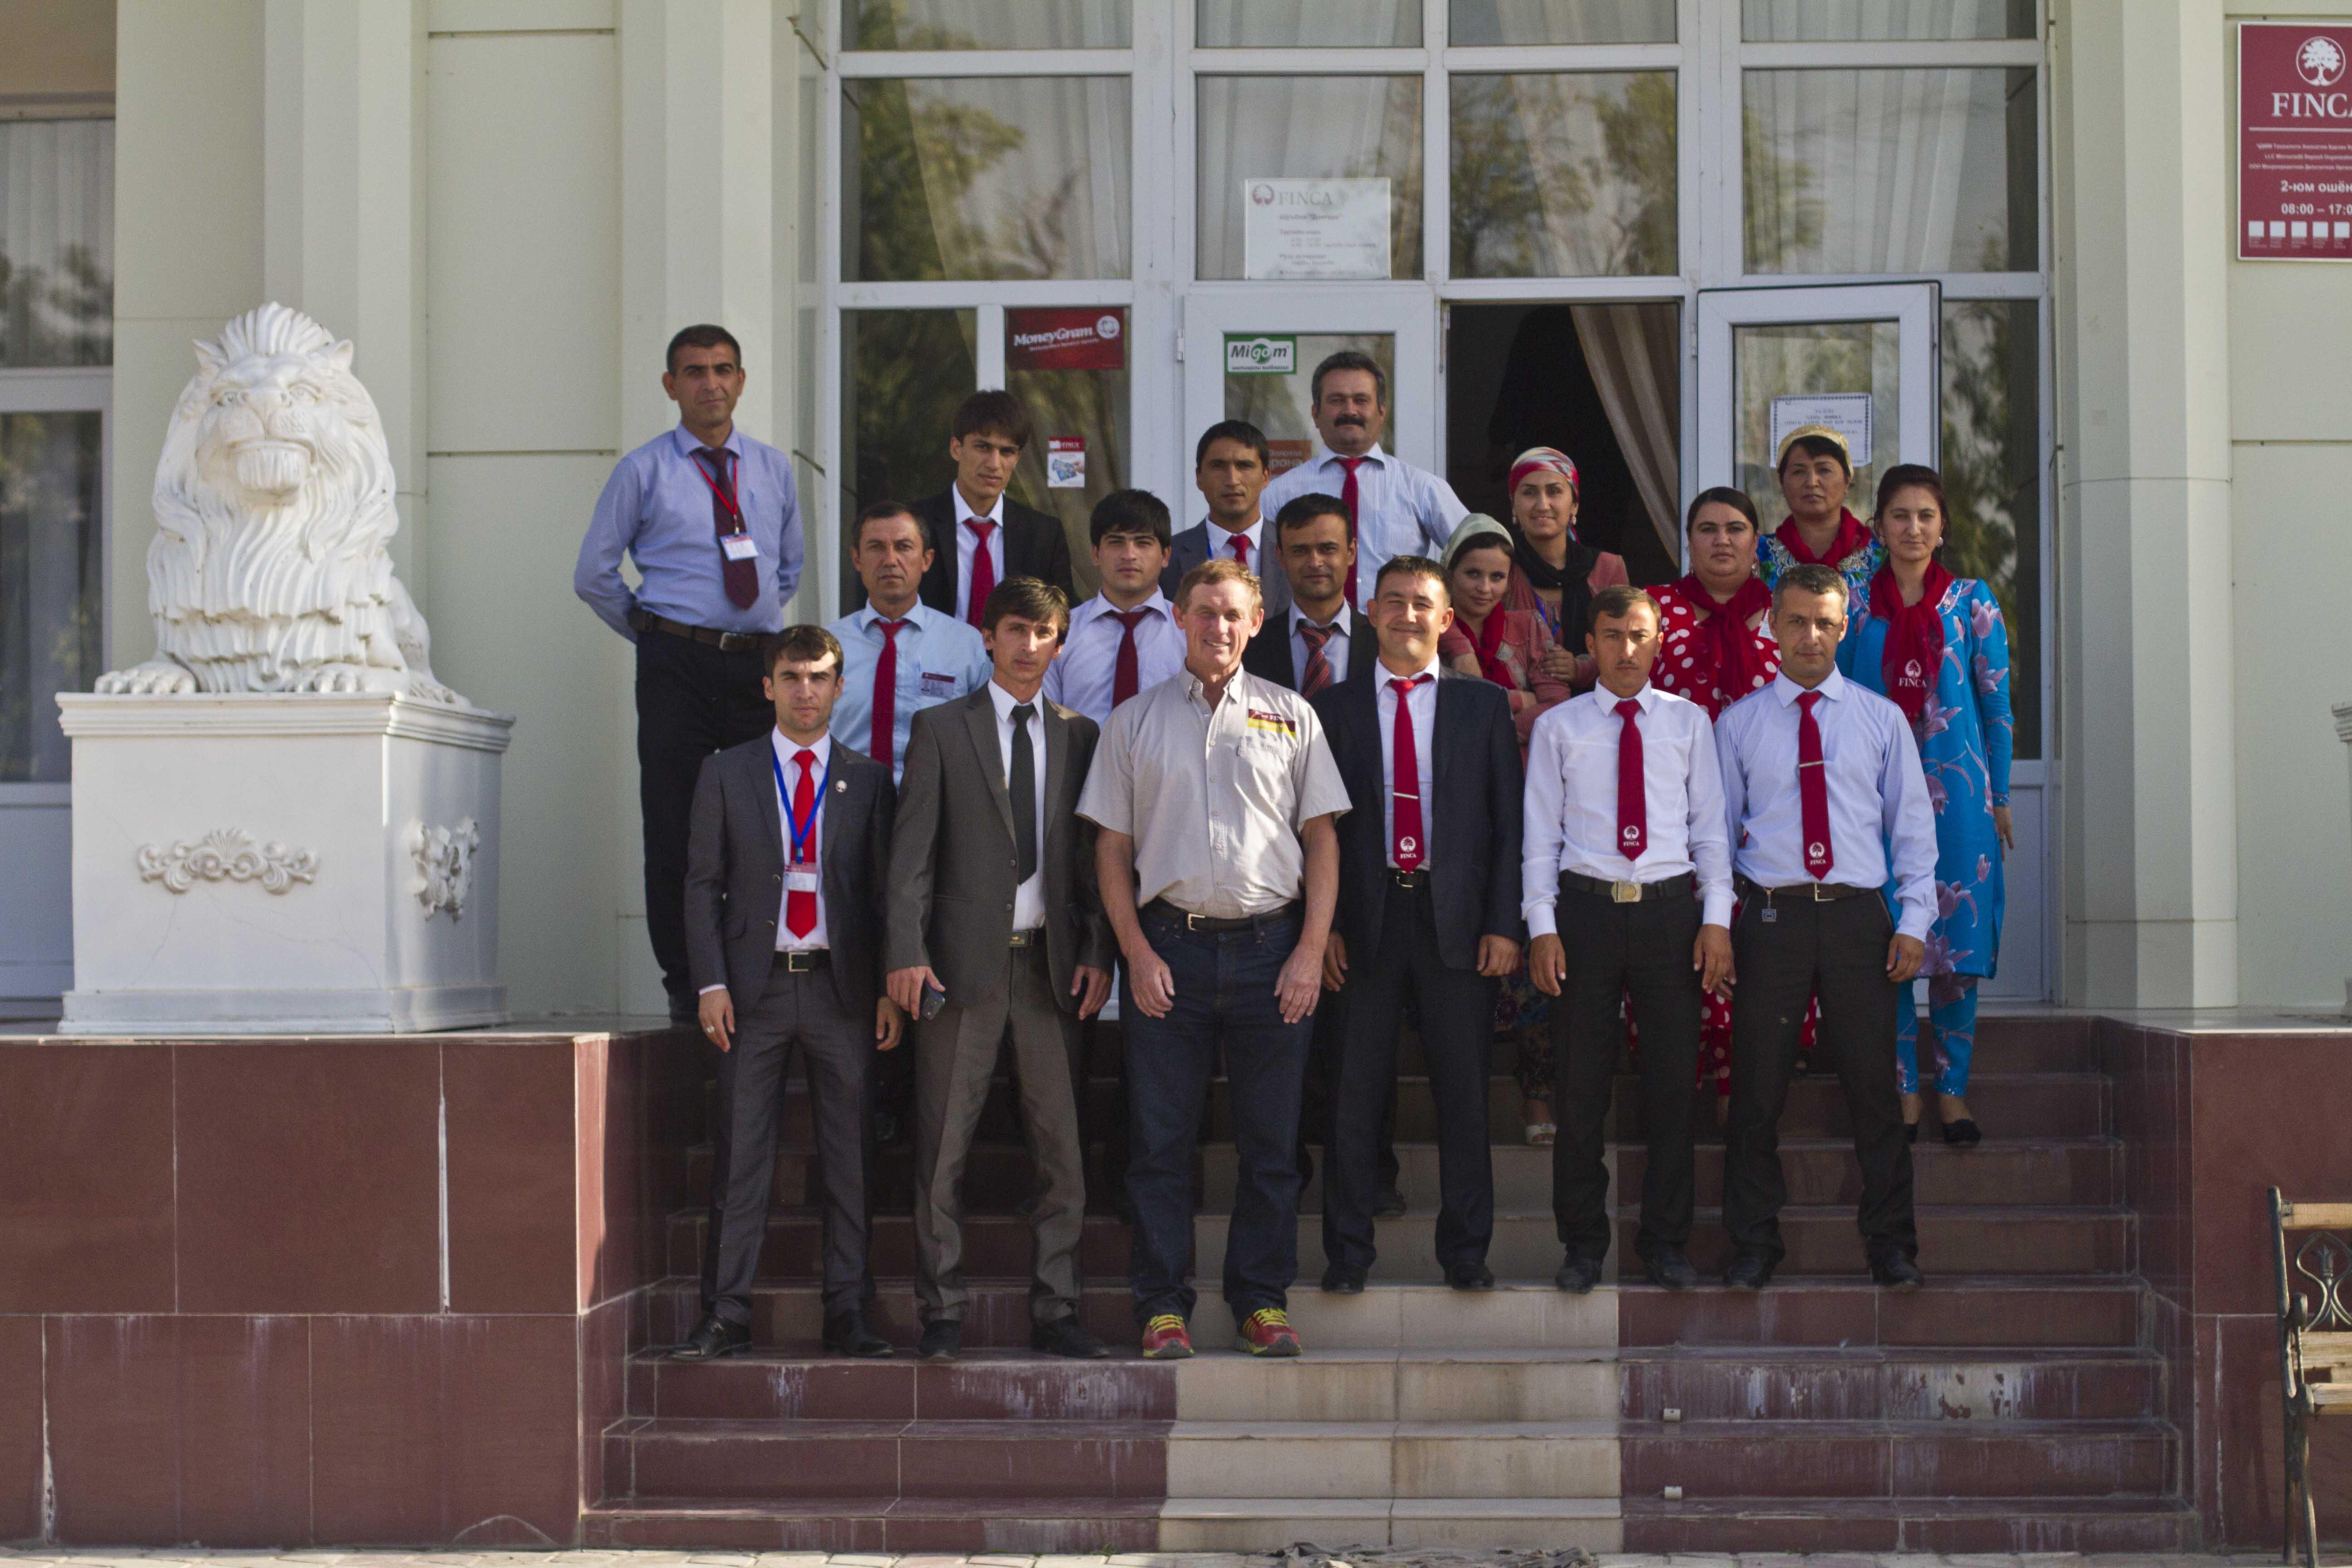 Rupert Scofield's Blog – Tajikistan